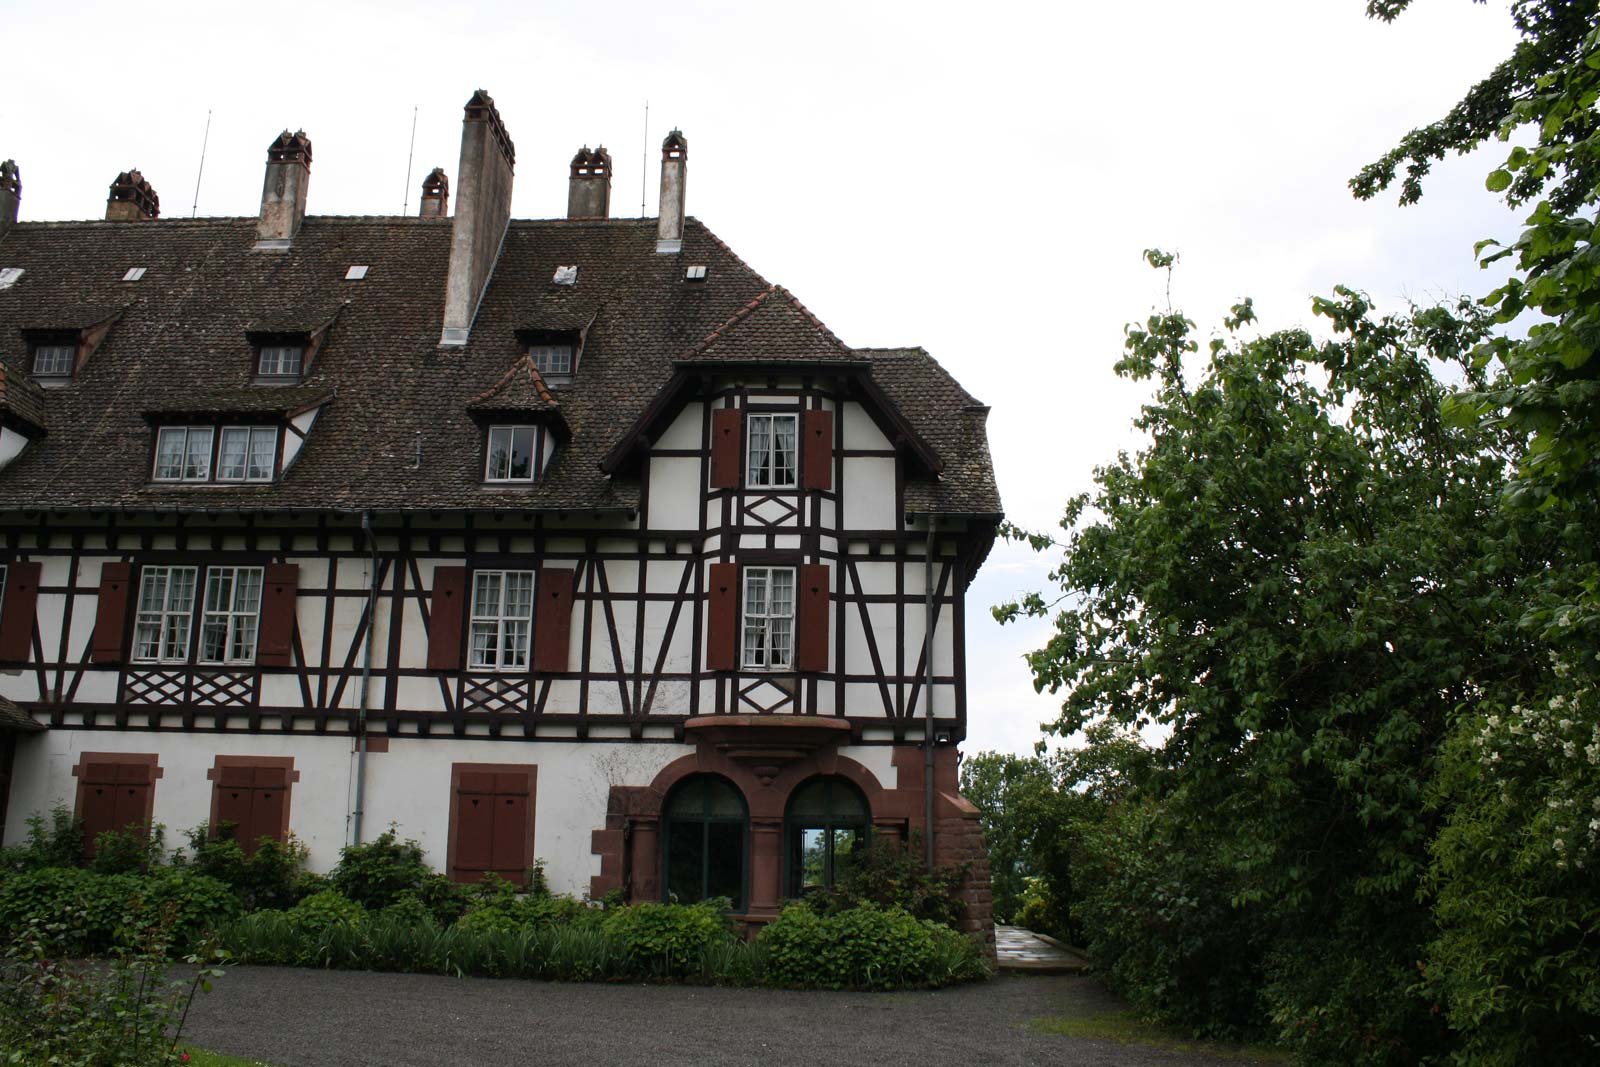 Villa le riesack niederbronn les bains for Piscine niederbronn